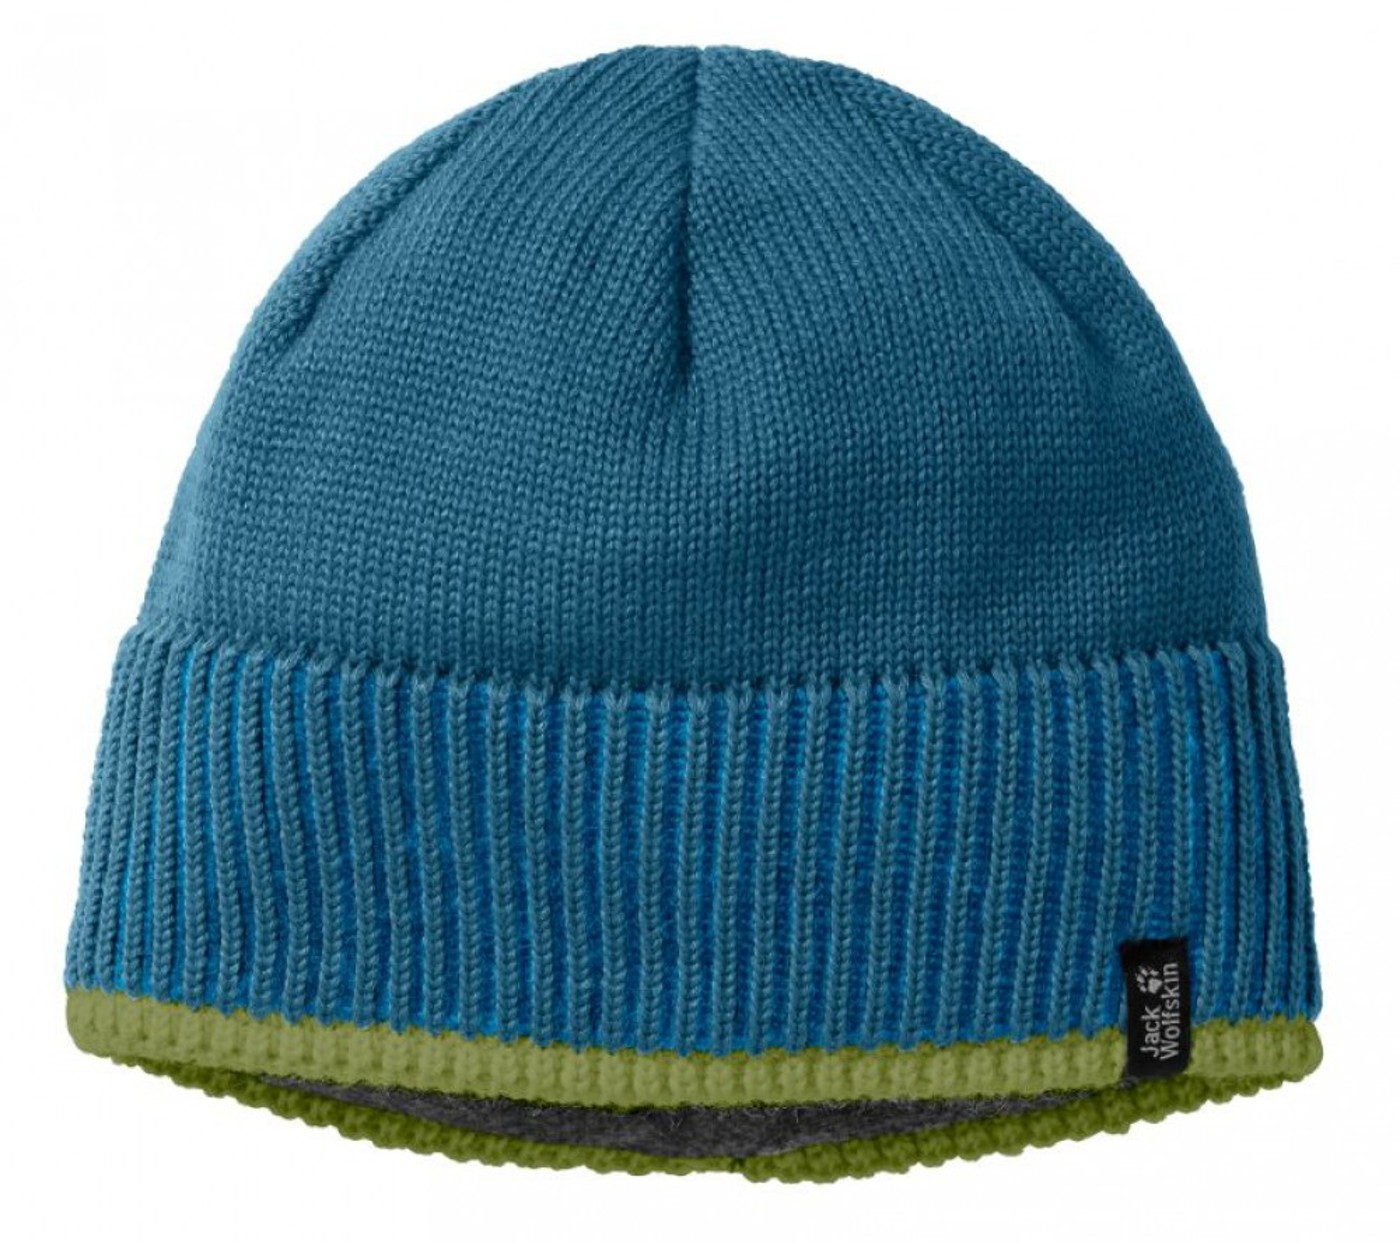 JACK WOLFSKIN GREAT SNOW CAP - Herren